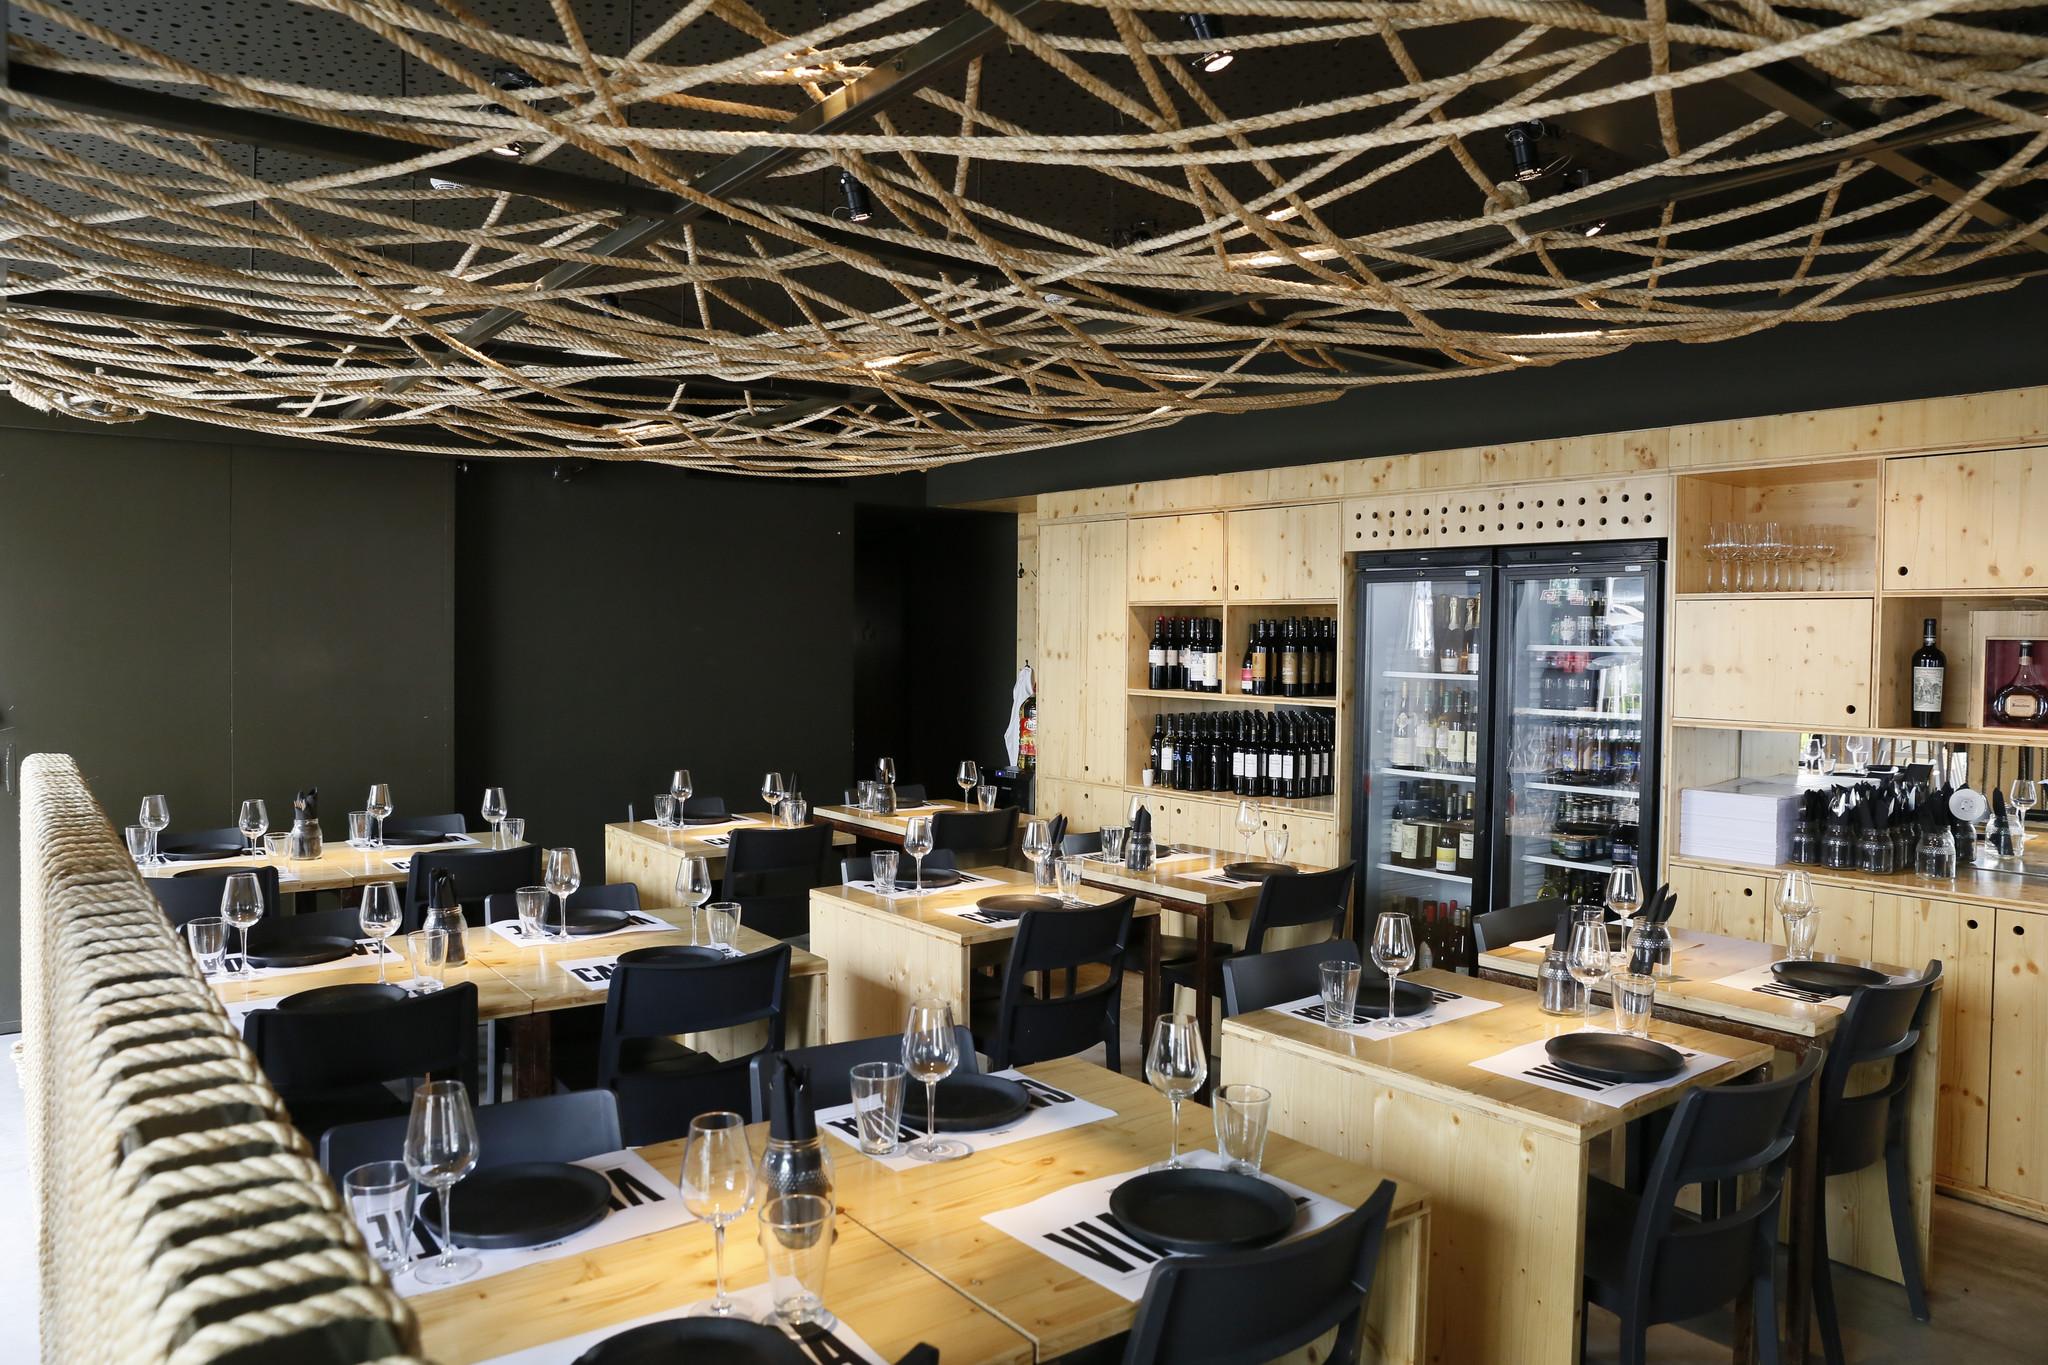 MJ Setubal - Restaurante Pedra de Sal 01.JPG